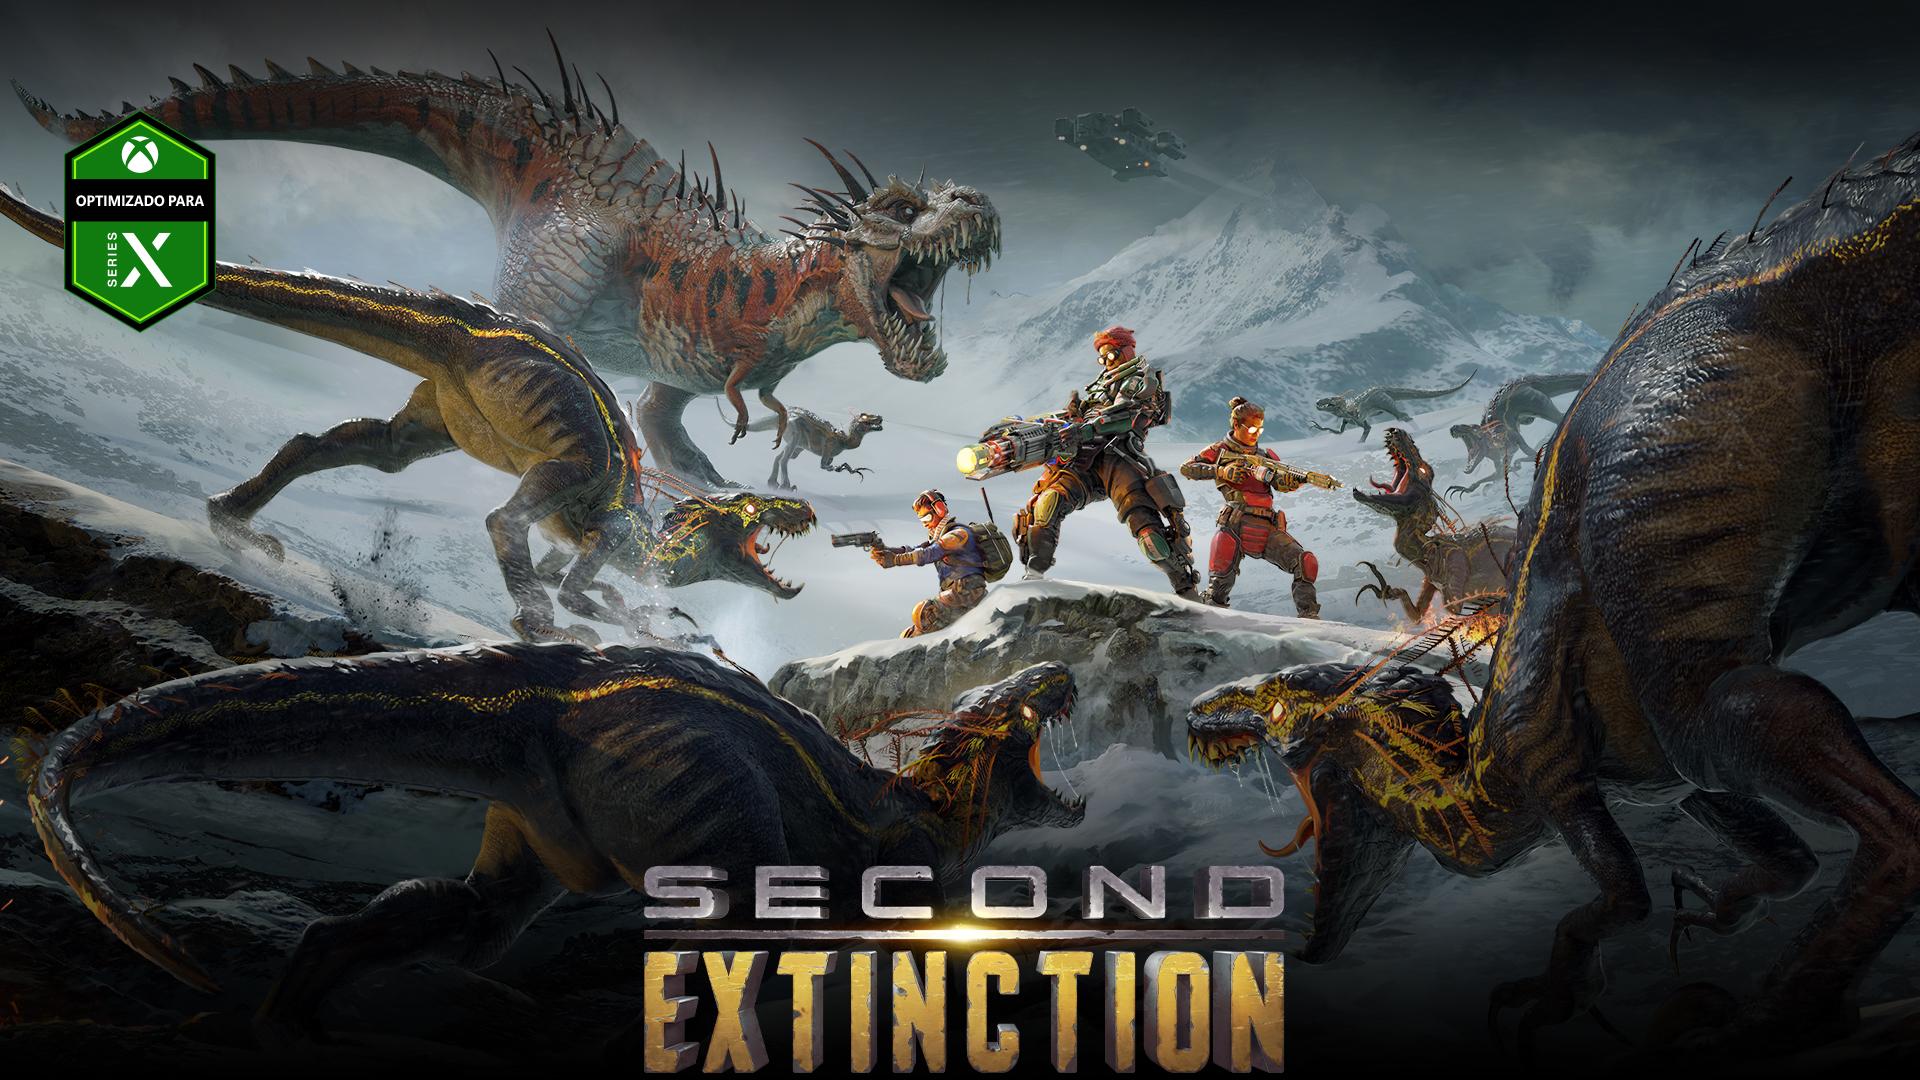 Second Extinction, Optimizado para Series X, un grupo de personajes lucha contra varios dinosaurios.